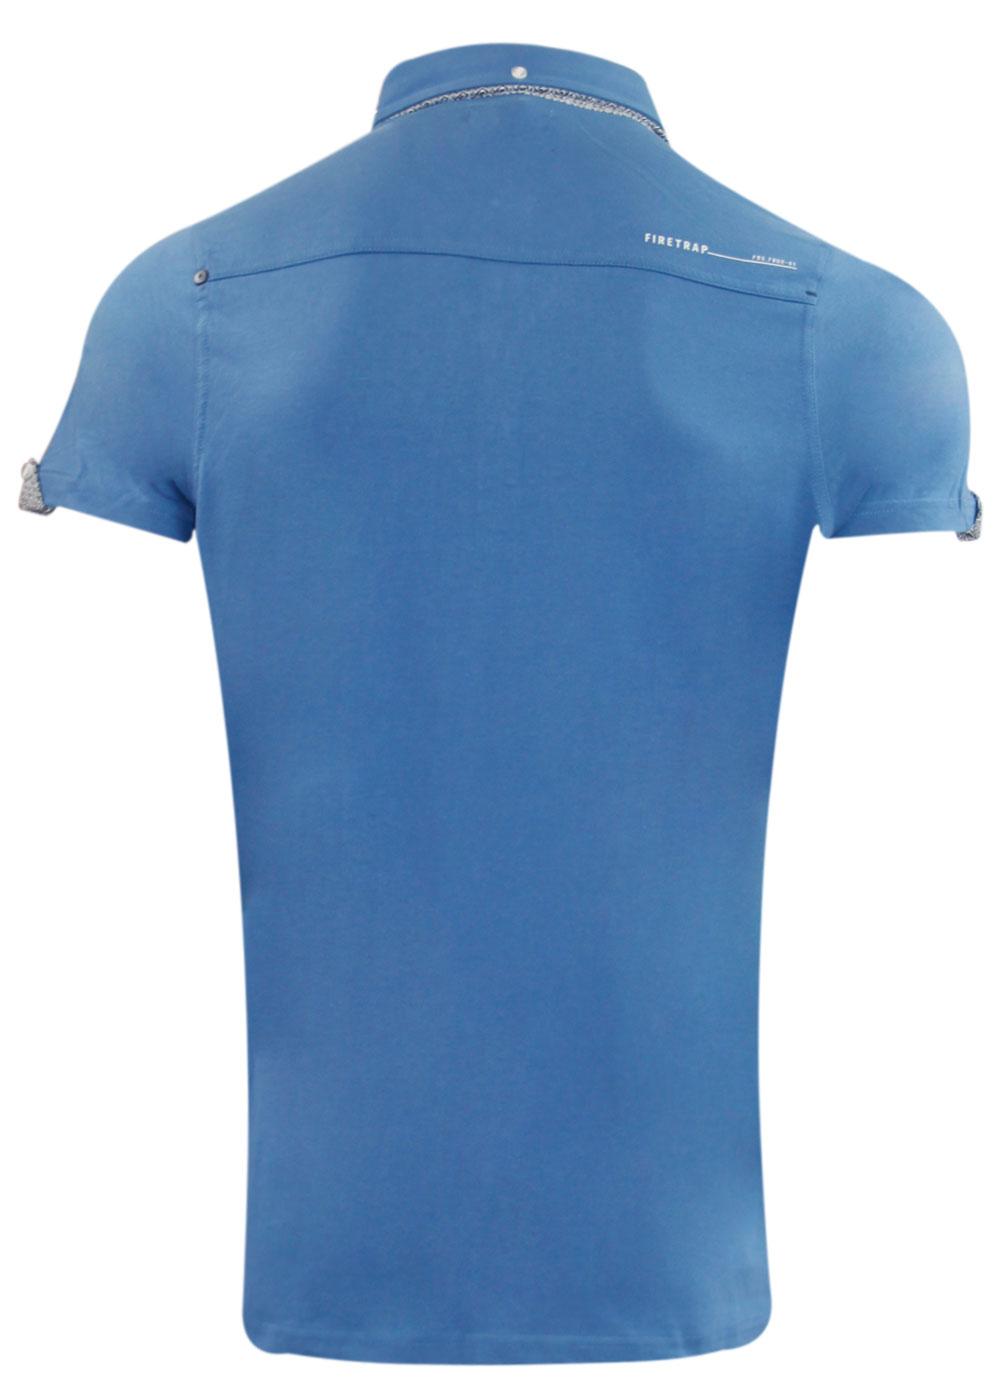 Mens New Branded Fire Trap Designer Collar Pocket Cotton T-Shirt Button Top